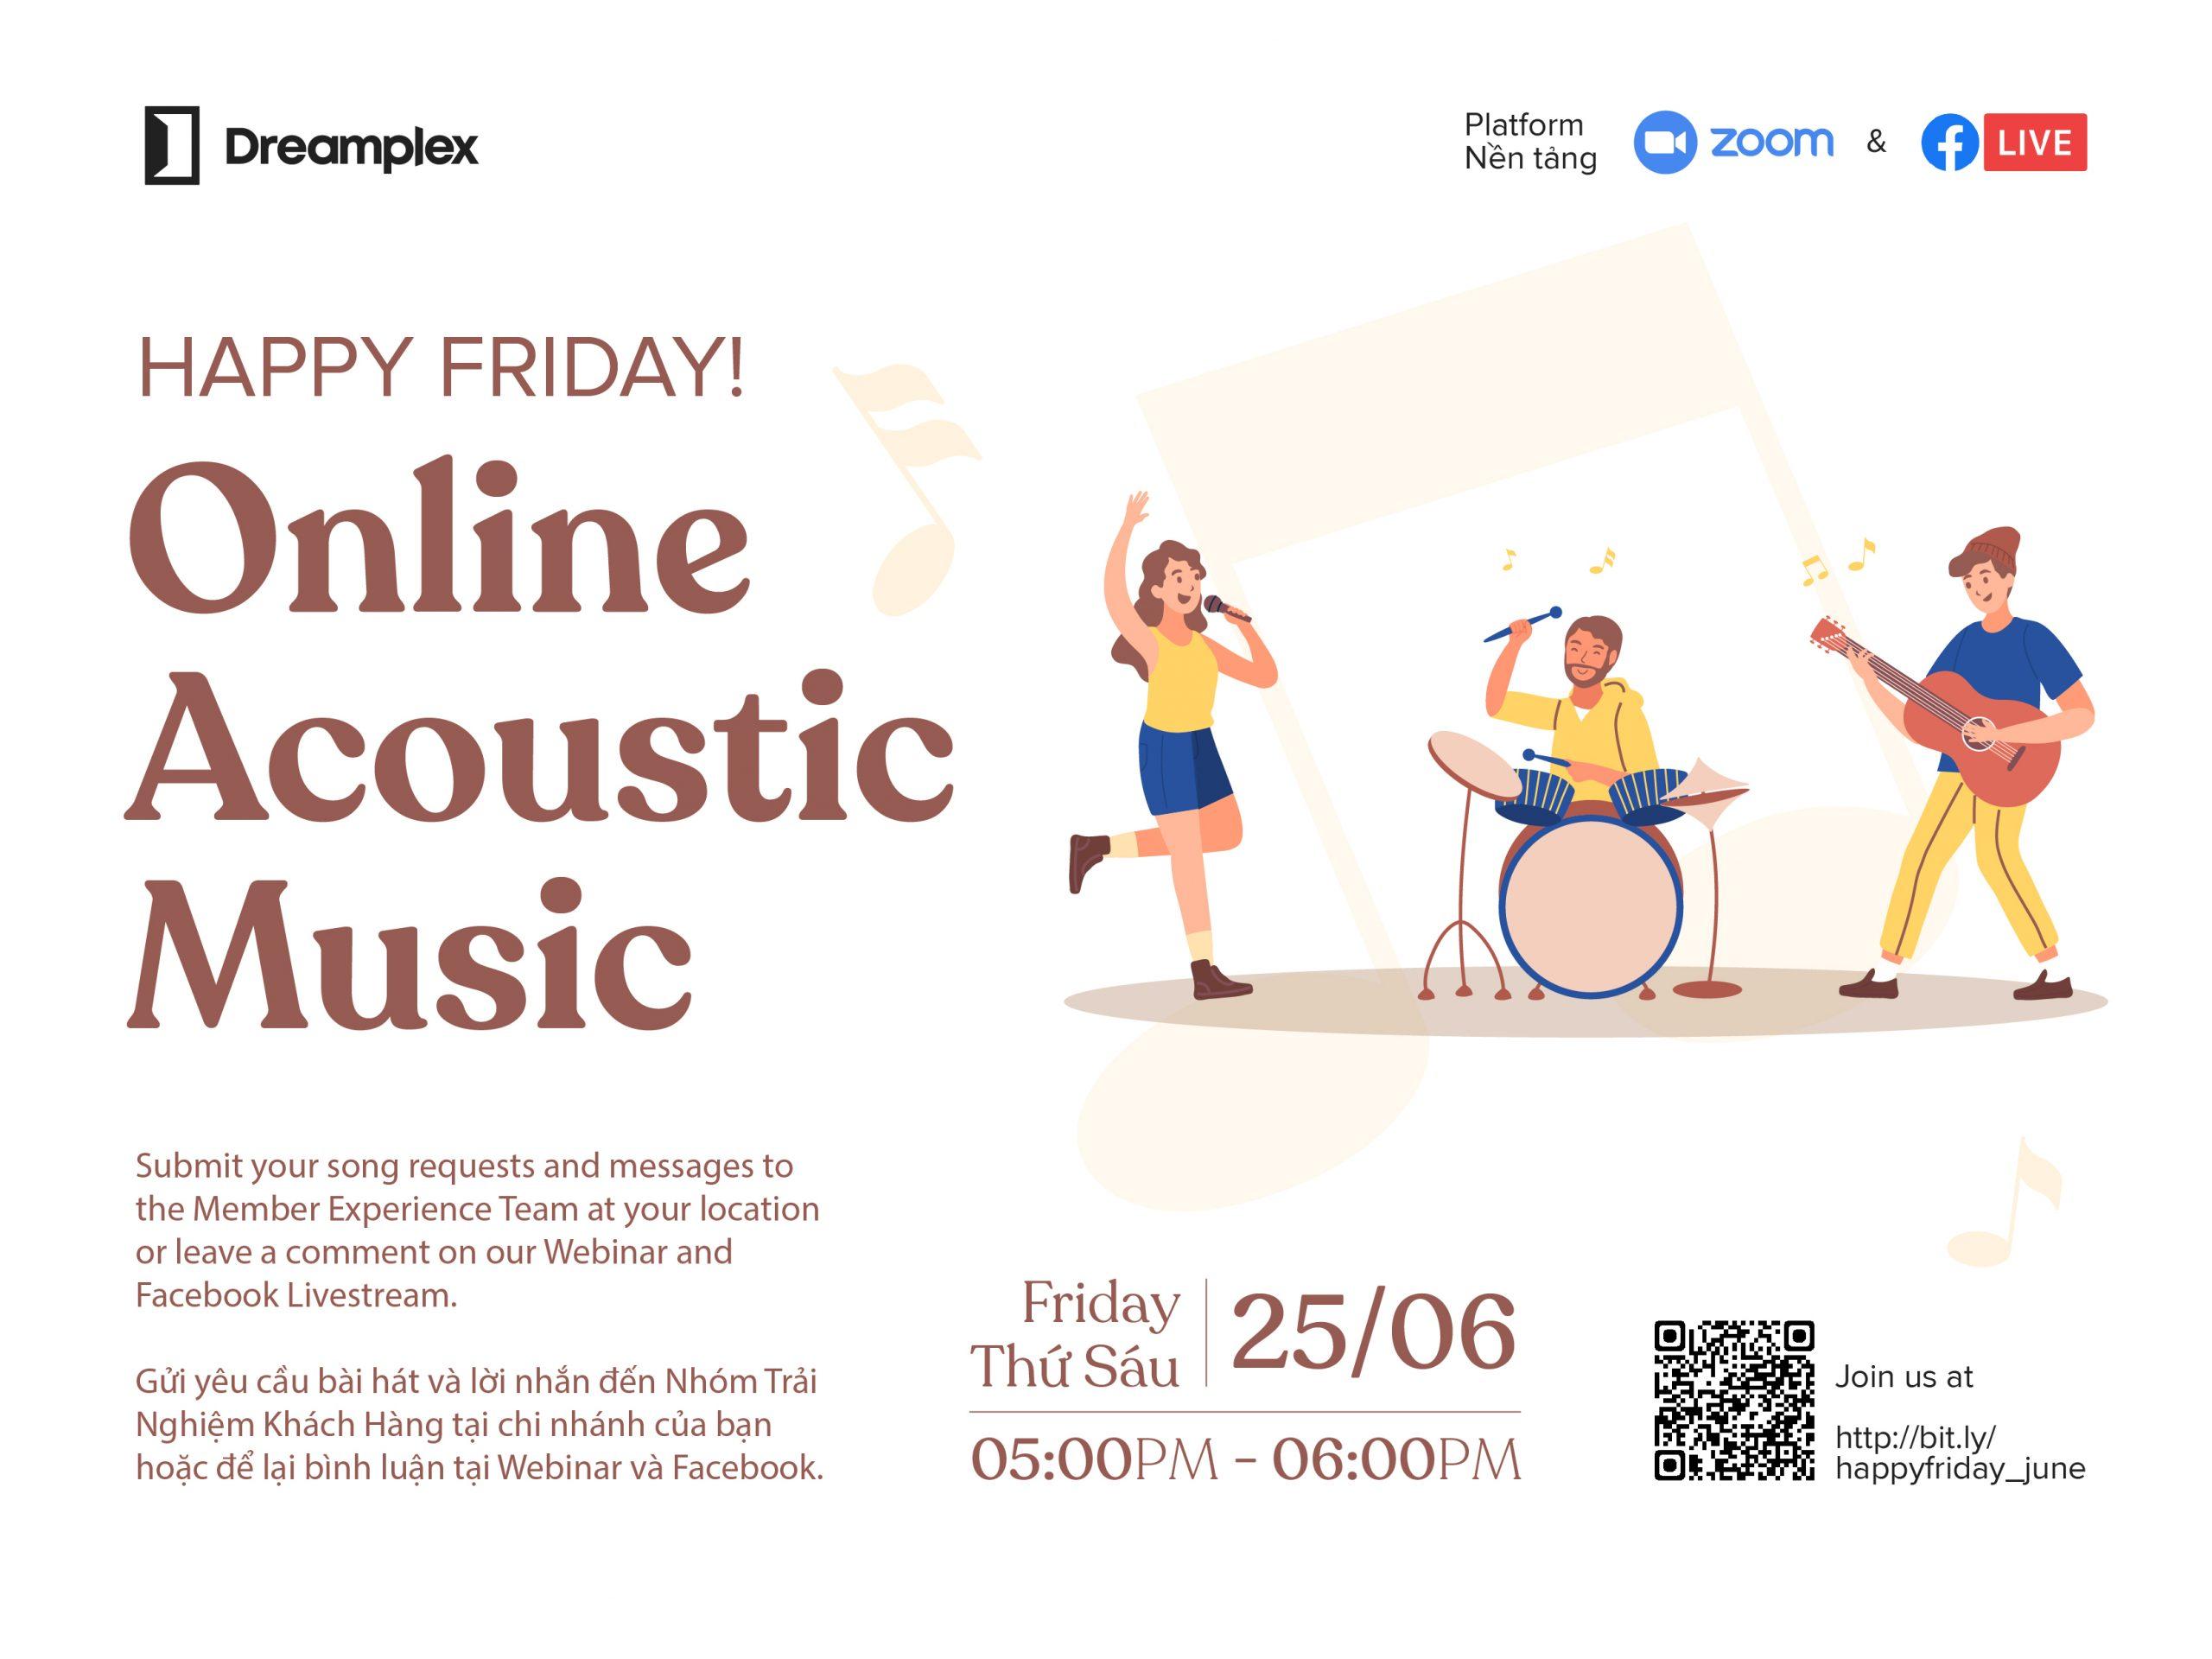 Online acoustic music